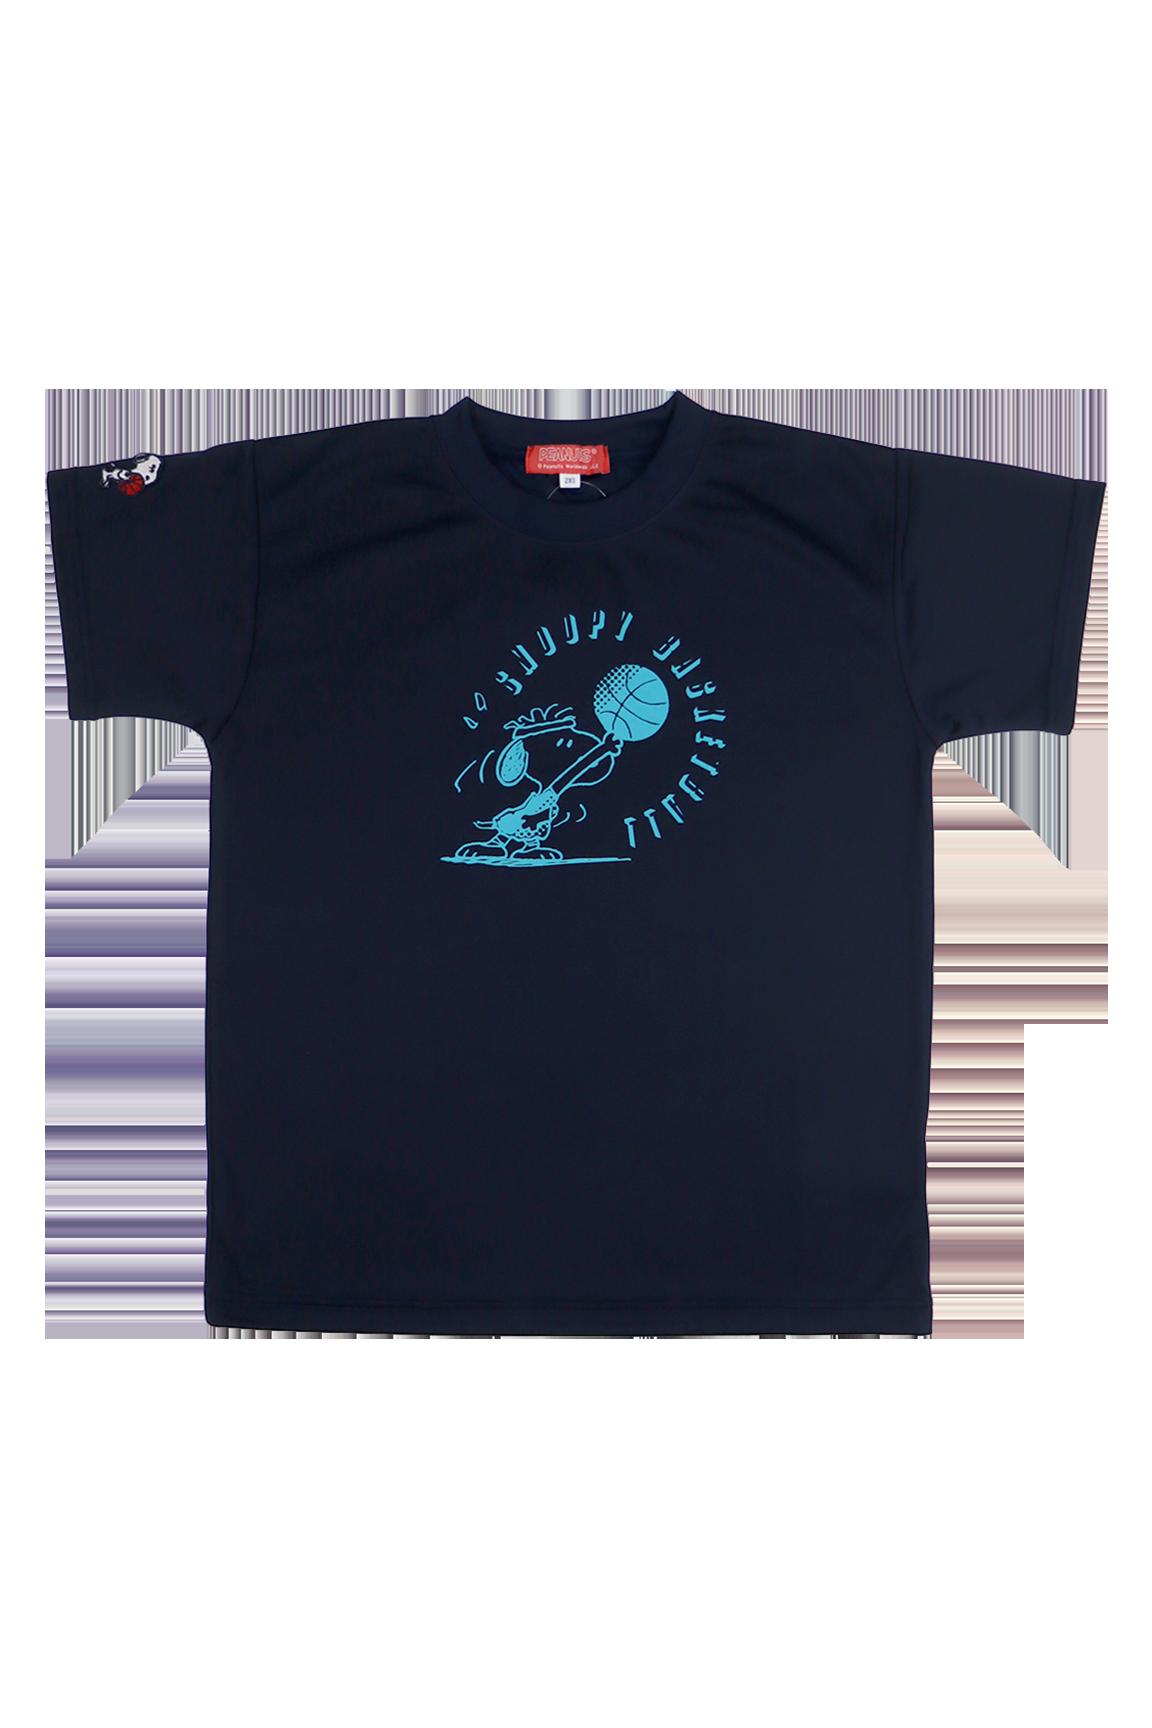 PNU-1585 /【2019春夏新作】 BALL LINE × PEANUTS / BASIC T-SHIRT / Tシャツ / プラクティスシャツ / ボールライン / SNOOPY / スヌーピー